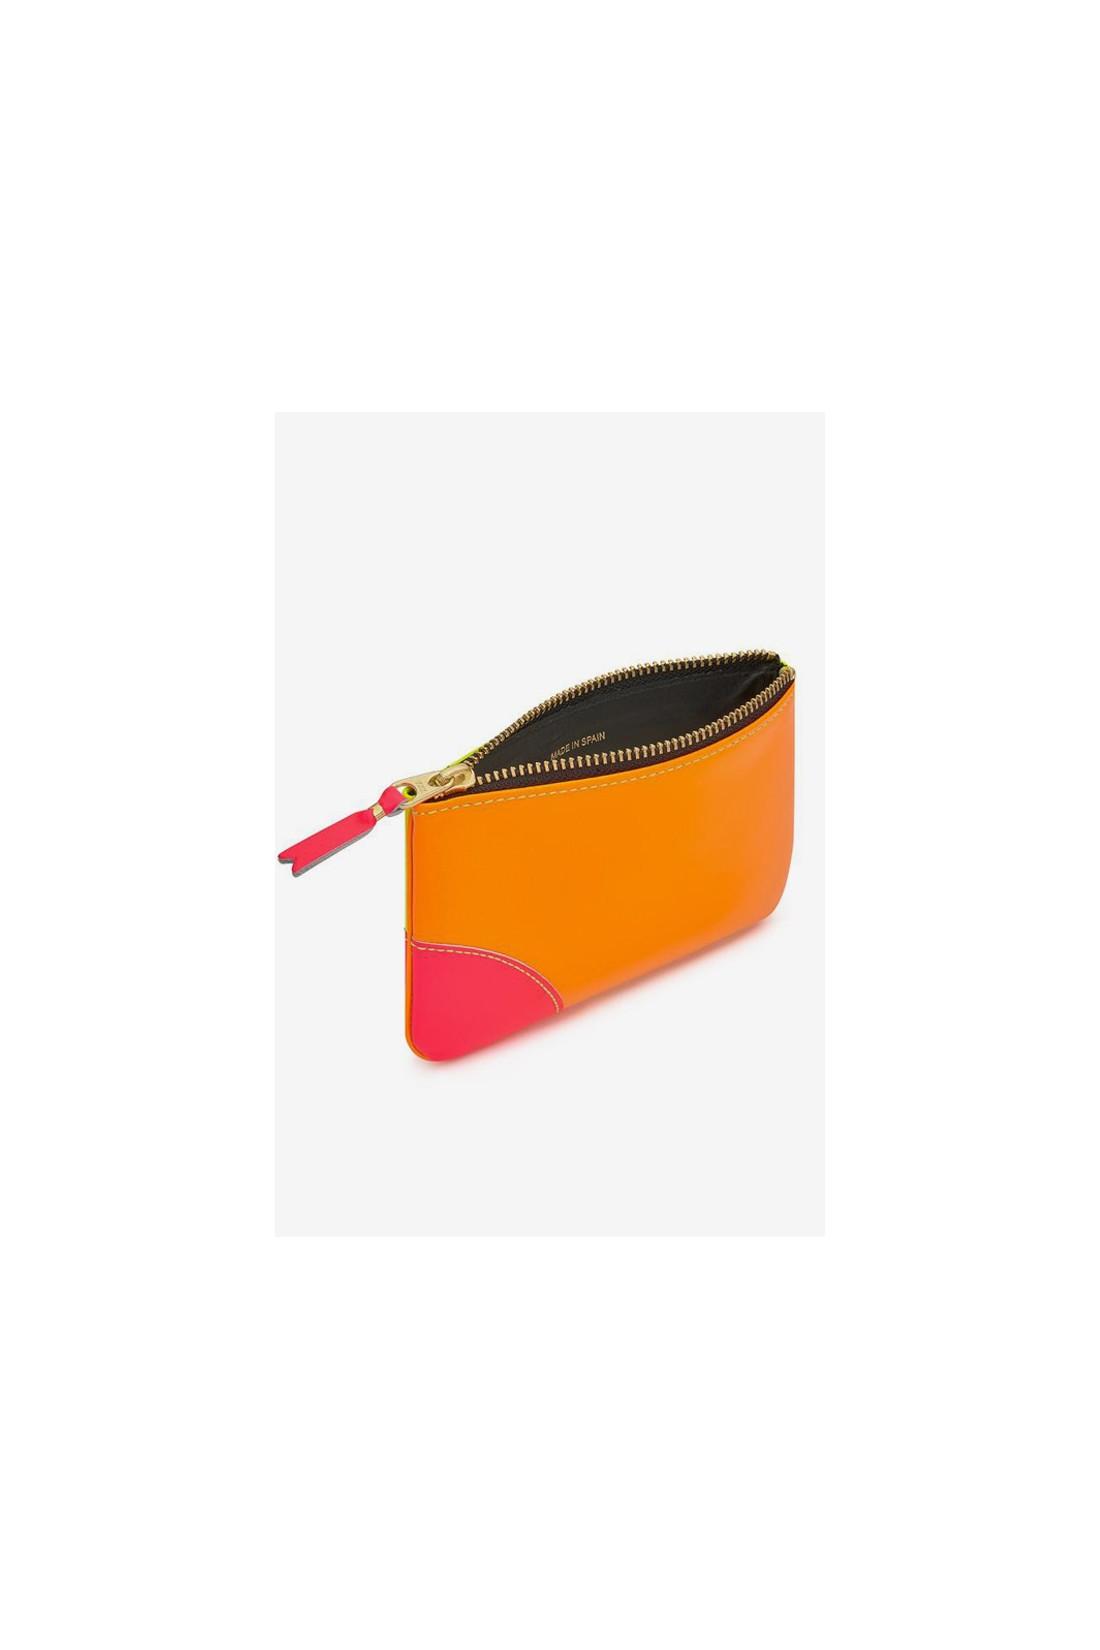 COMME DES GARÇONS WALLETS / Cdg super fluo sa8100sf Yellow orange